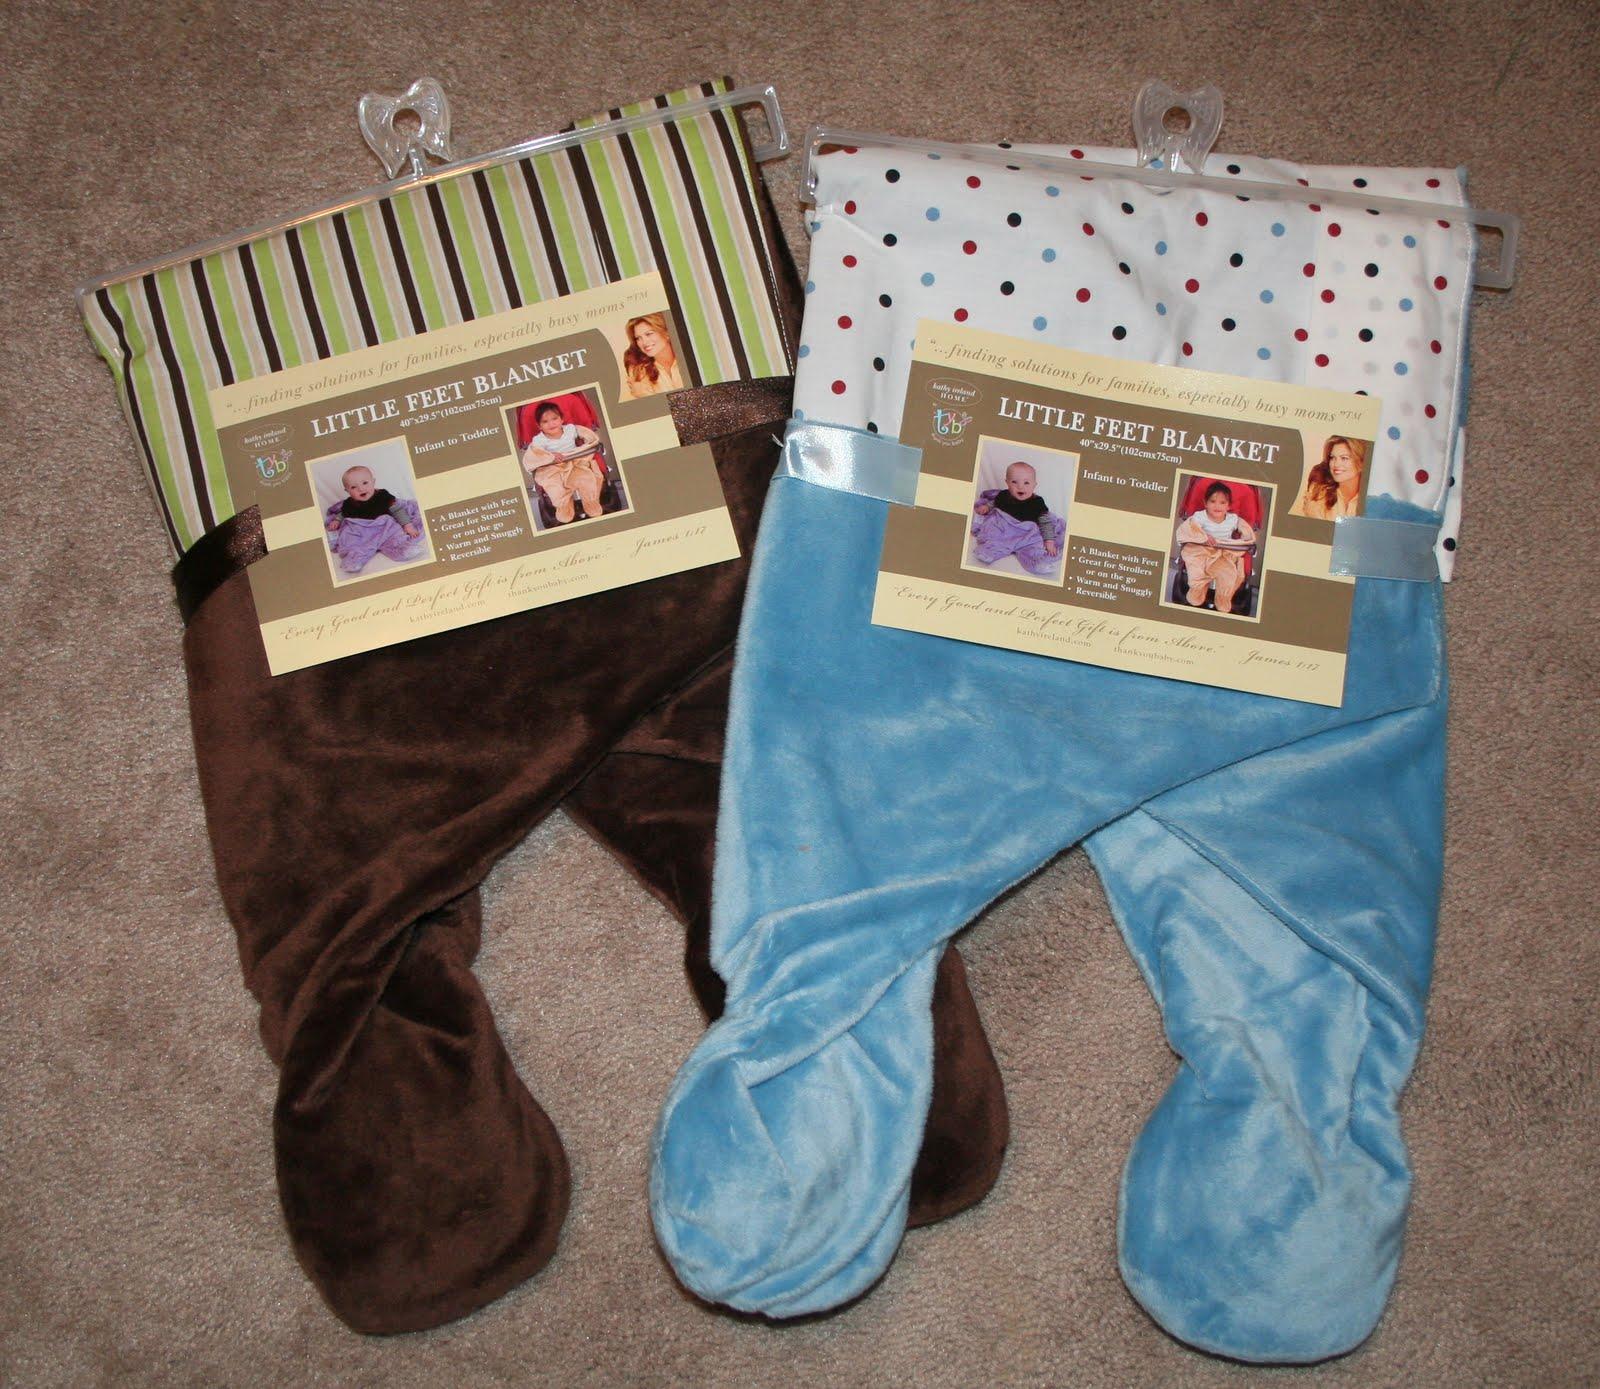 https://i2.wp.com/2.bp.blogspot.com/_TEy0xOVlybY/SxAQQOvXKEI/AAAAAAAAA2Q/yiX0zymreeA/s1600/little+feet+blankets.jpg